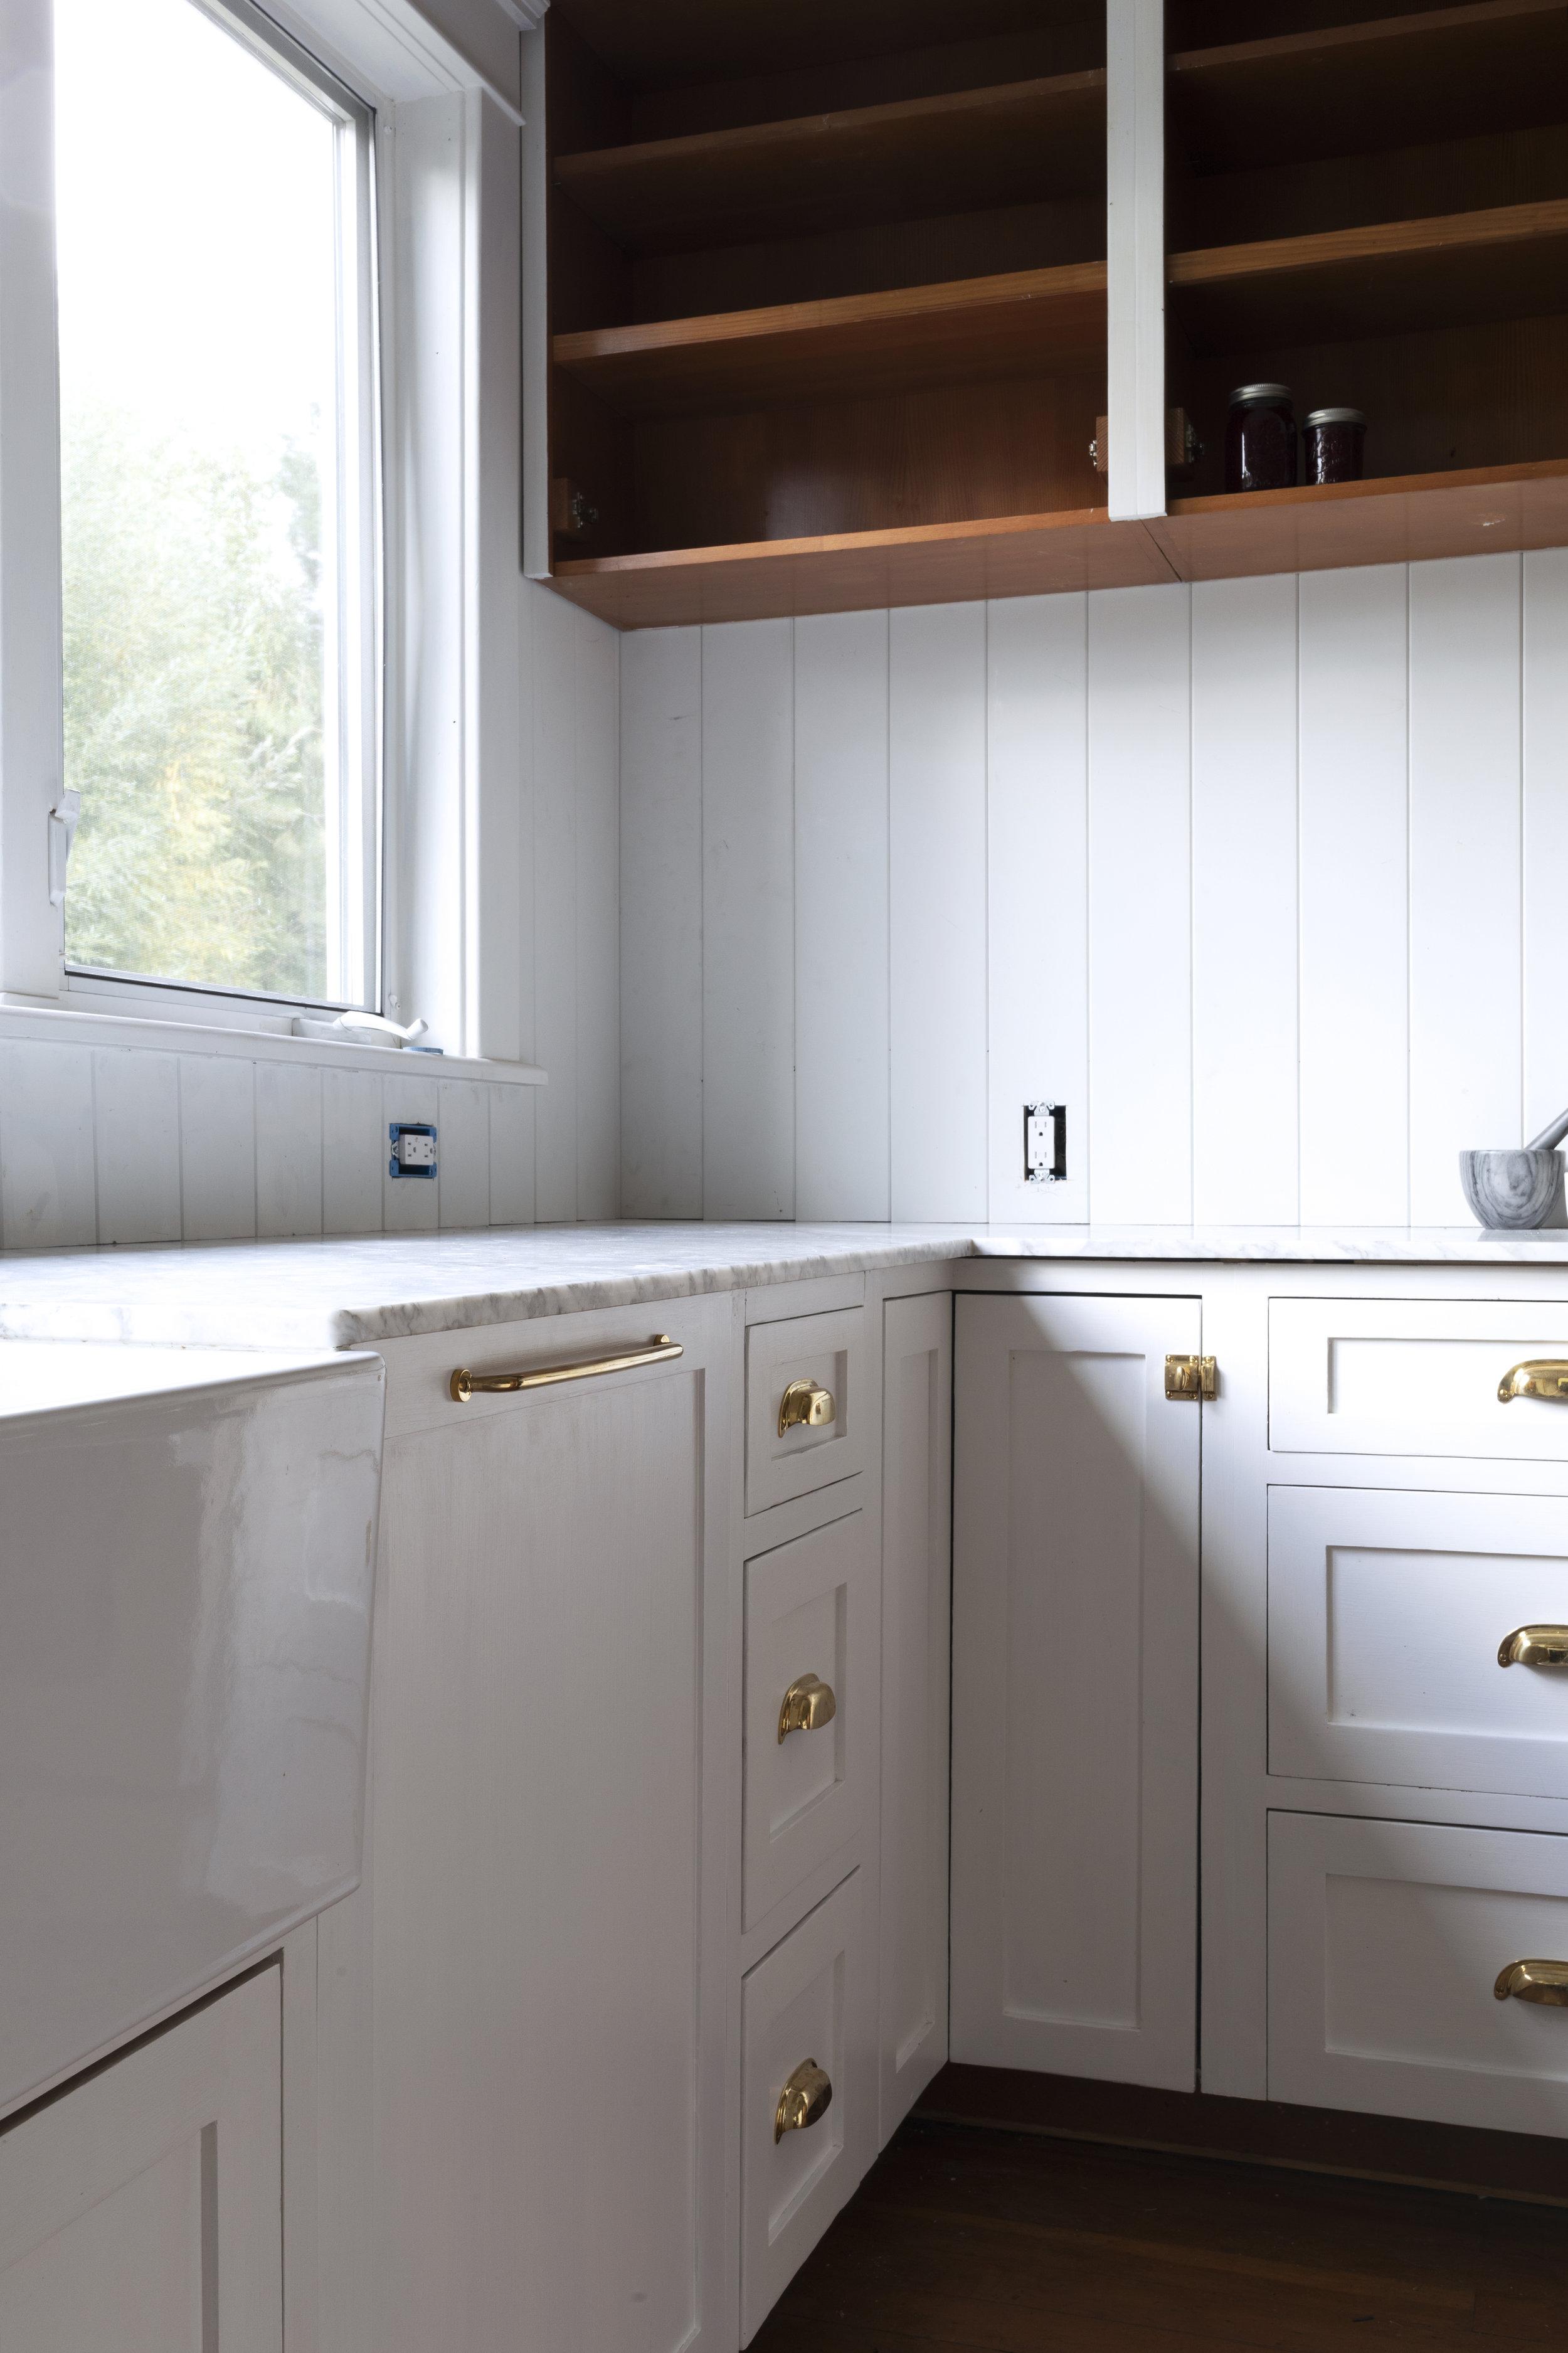 The Grit and Polish - Panel Ready Dishwasher 10.jpg